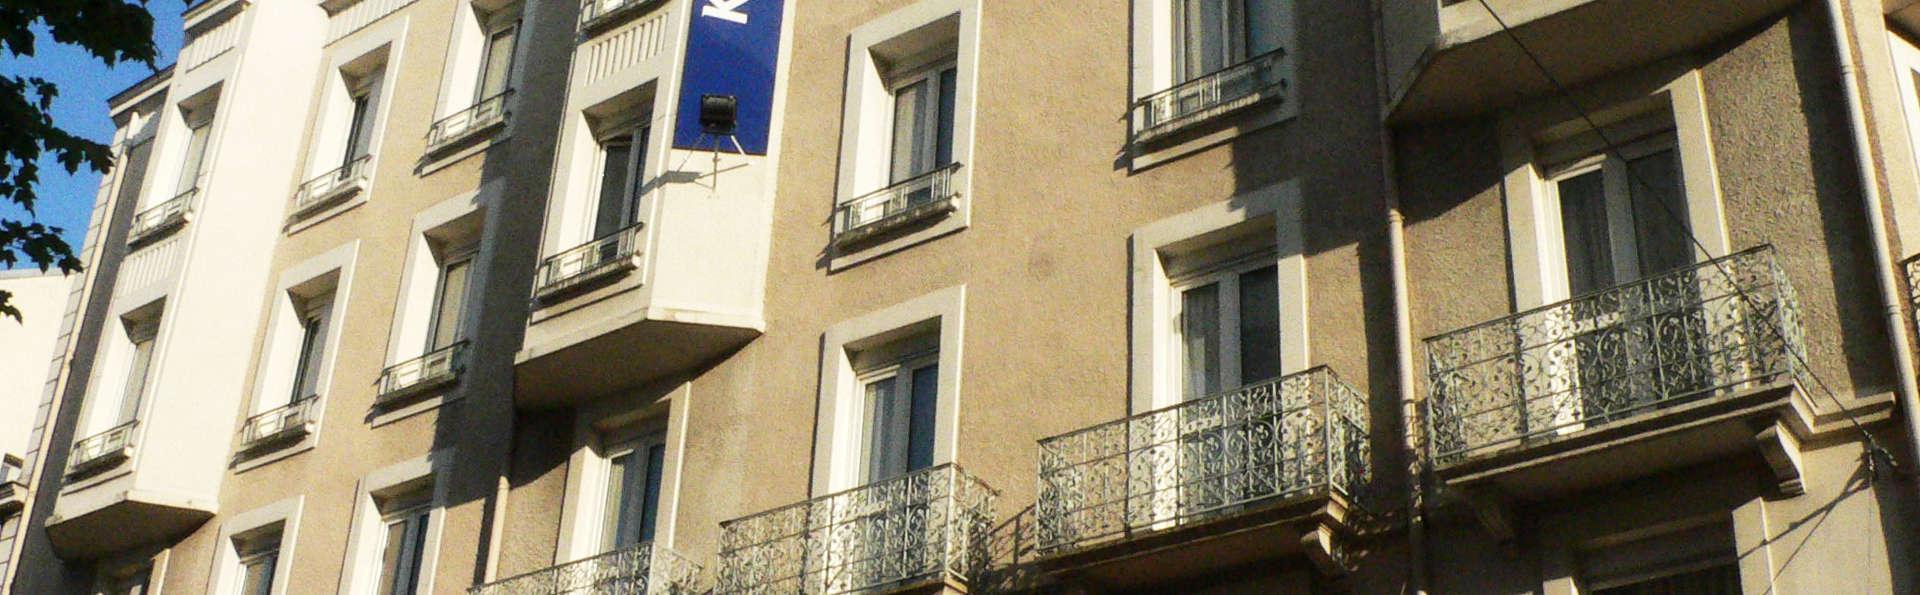 Central Hôtel Kyriad Vichy - EDIT_front1.jpg